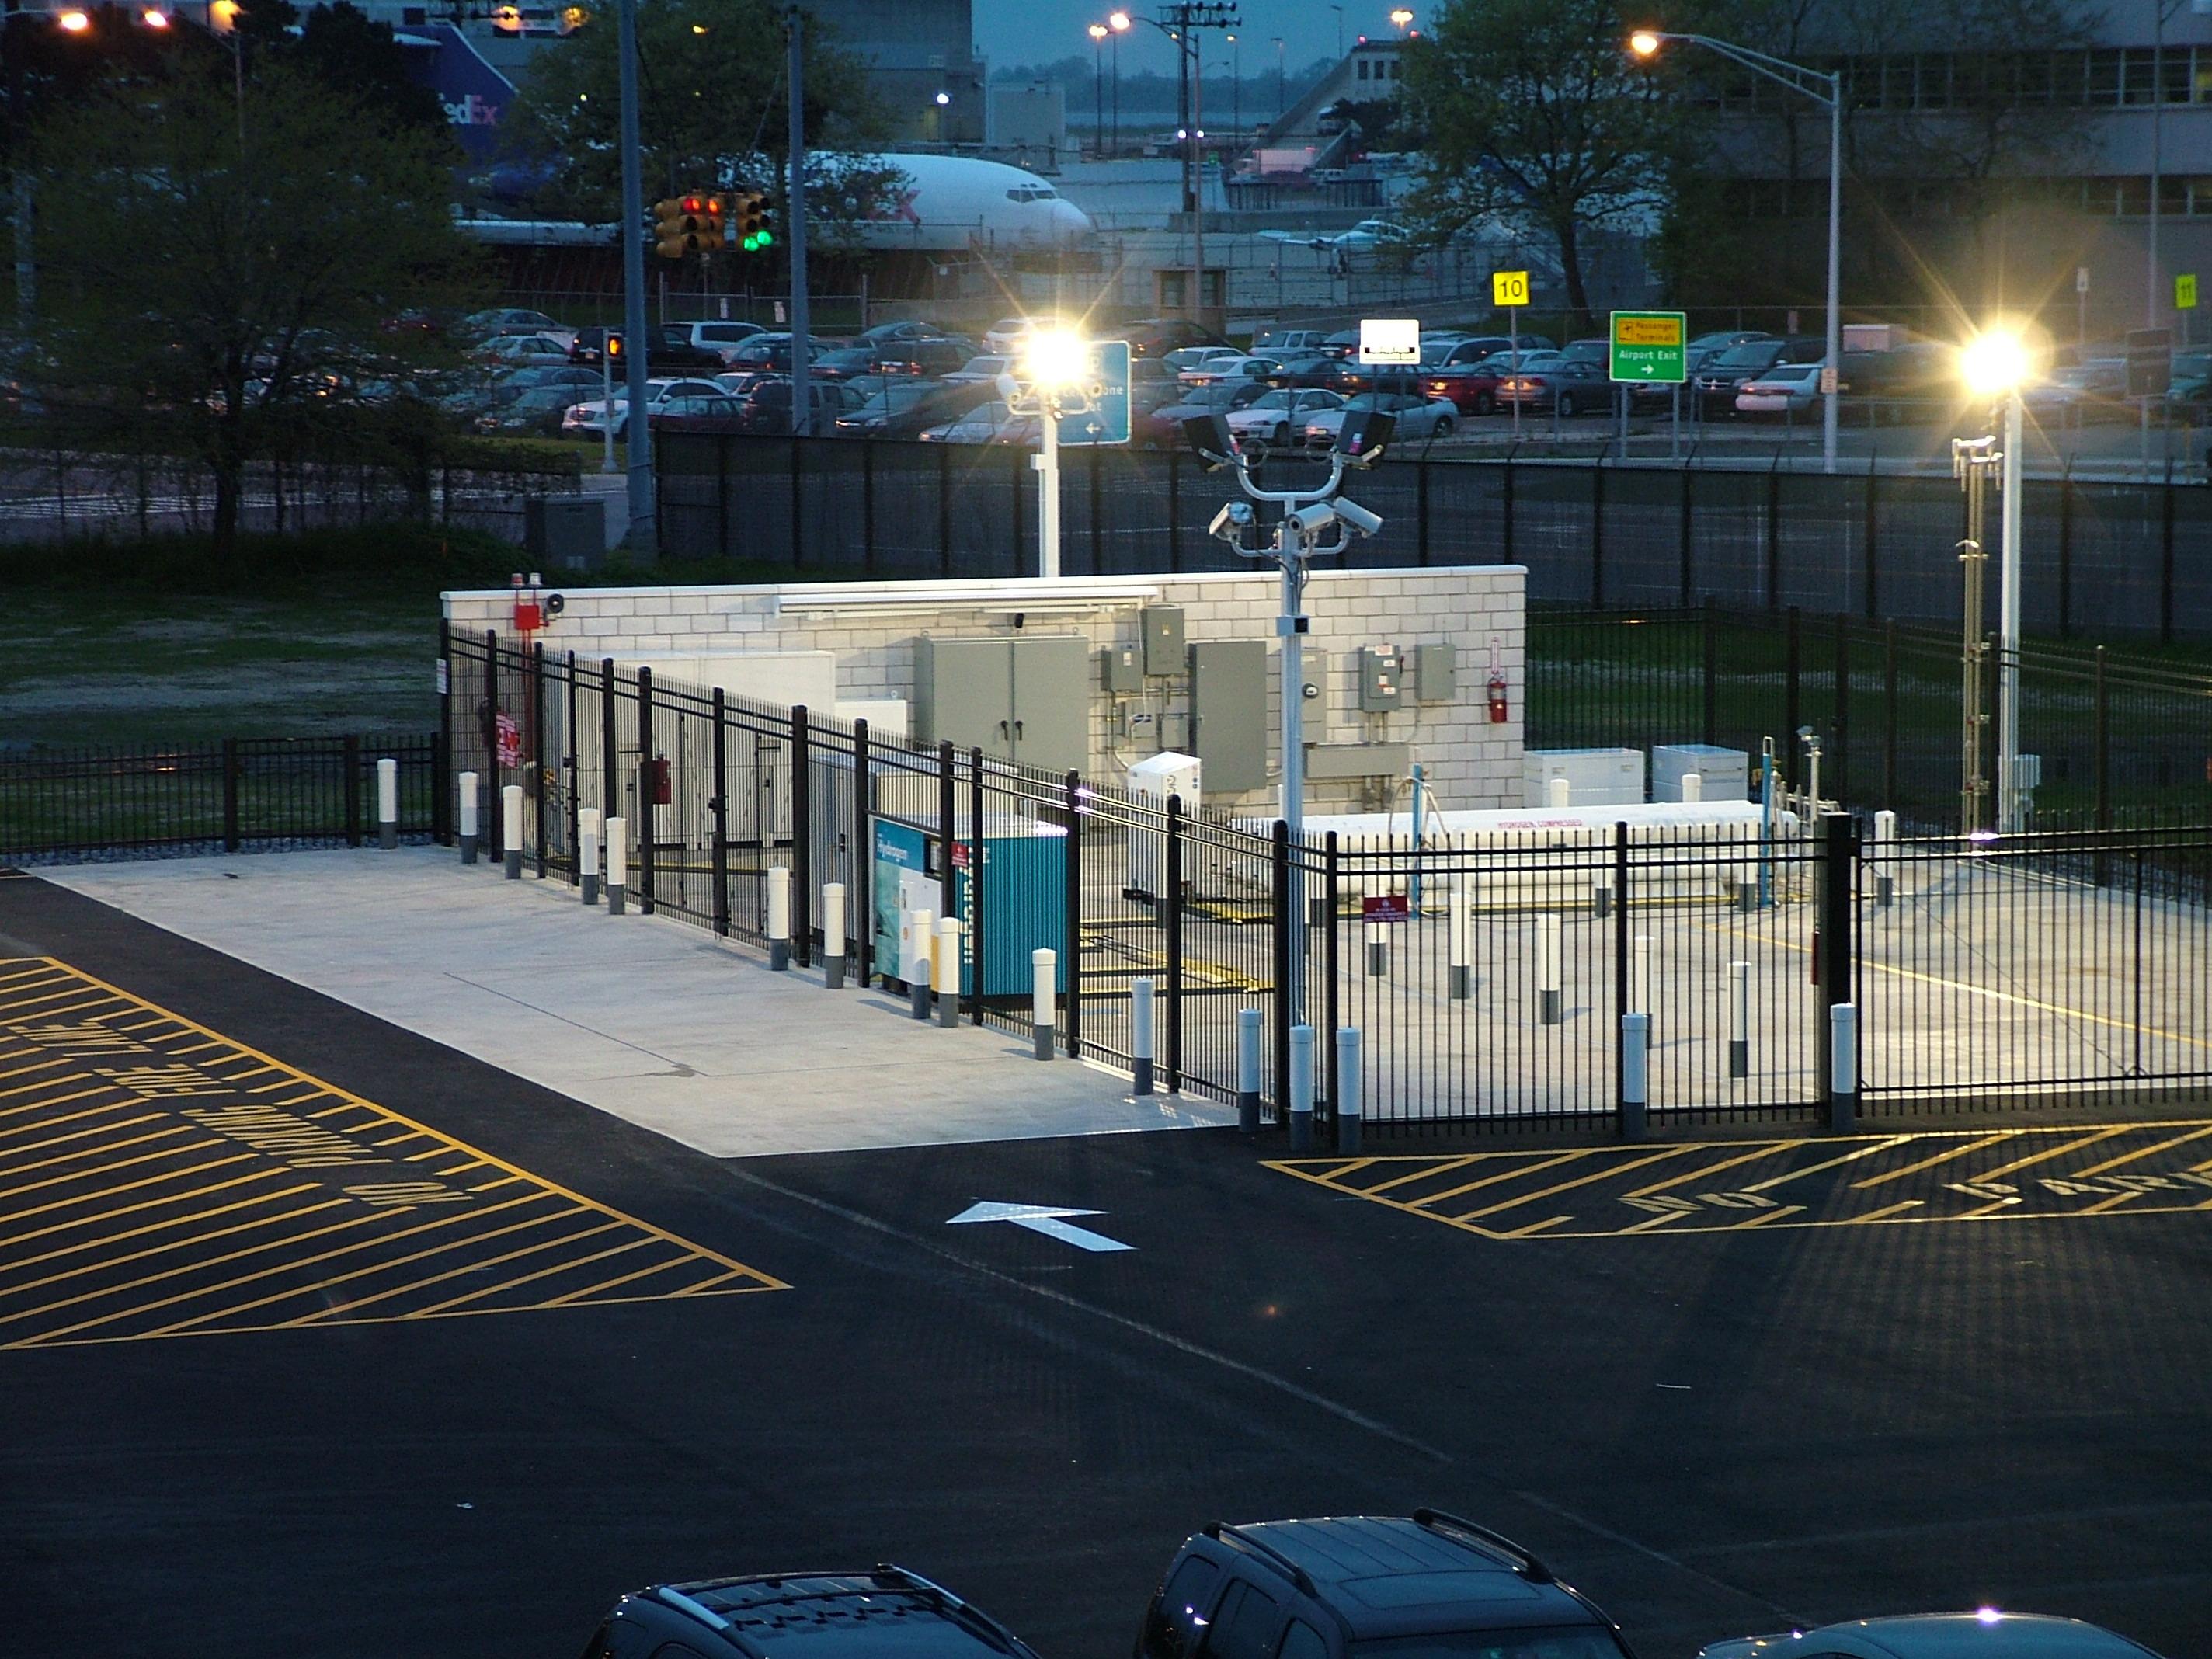 JFK Hydrogen Filling Station